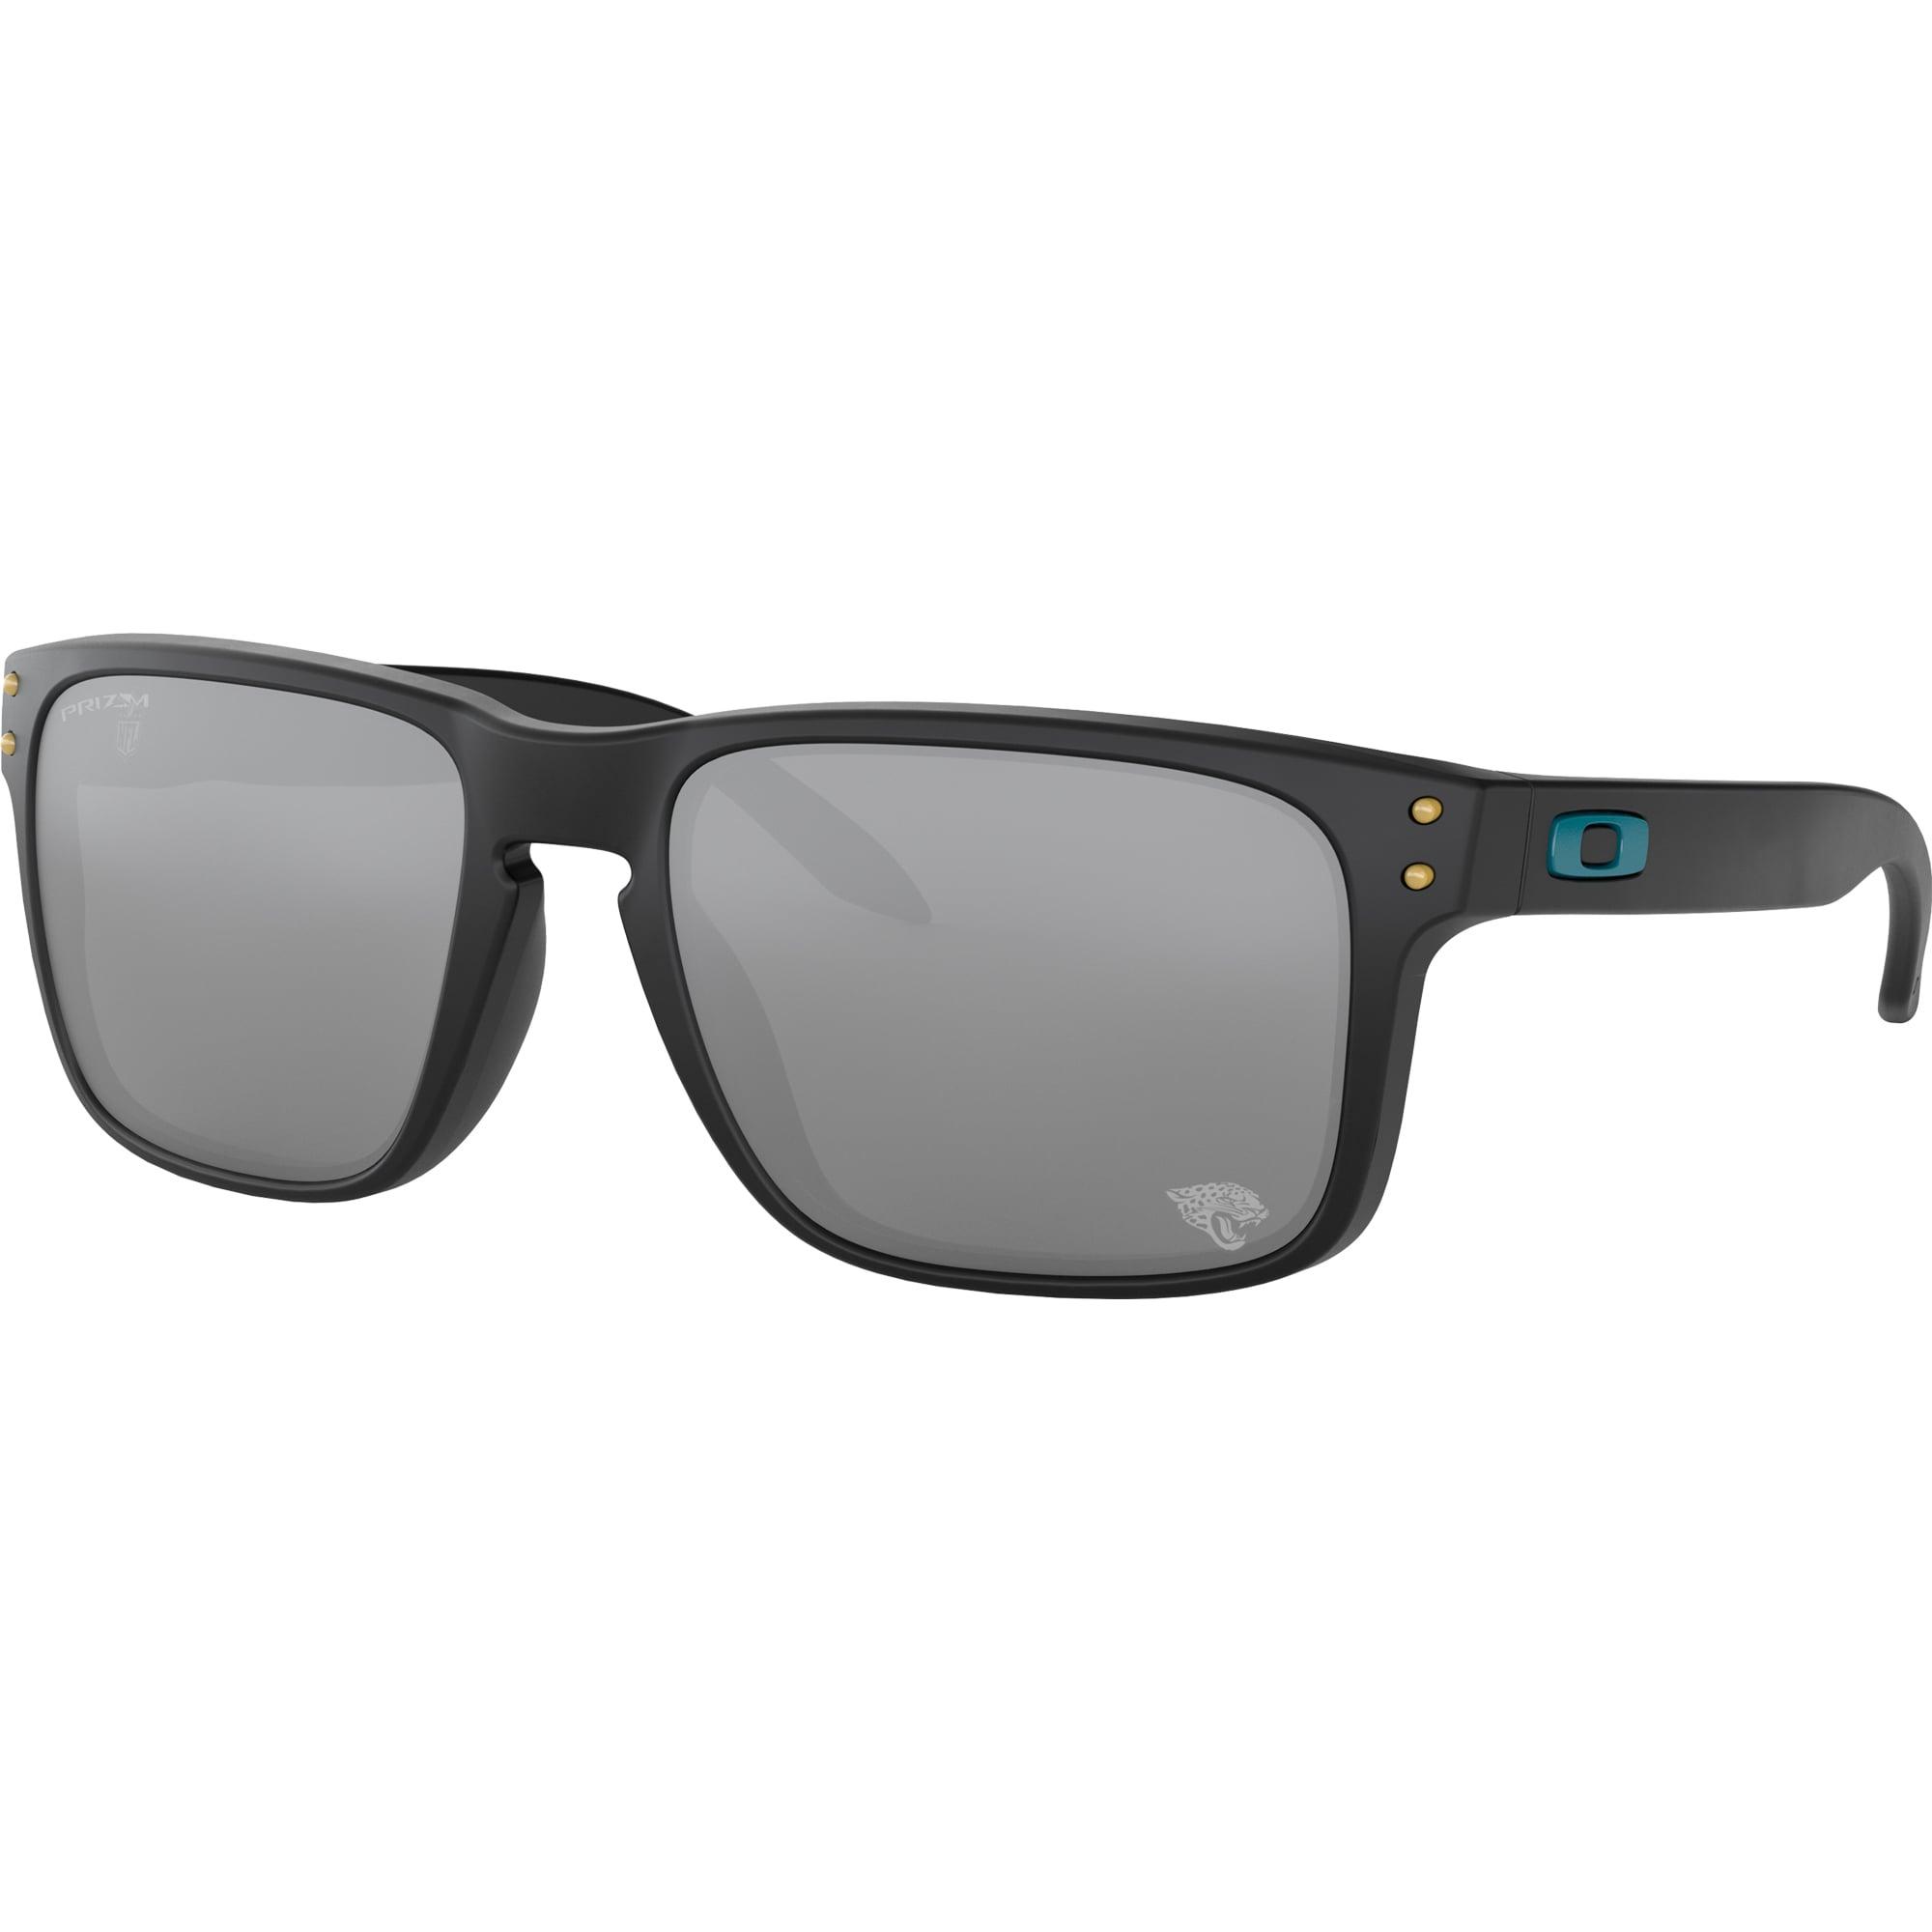 Jacksonville Jaguars Oakley Holbrook Sunglasses